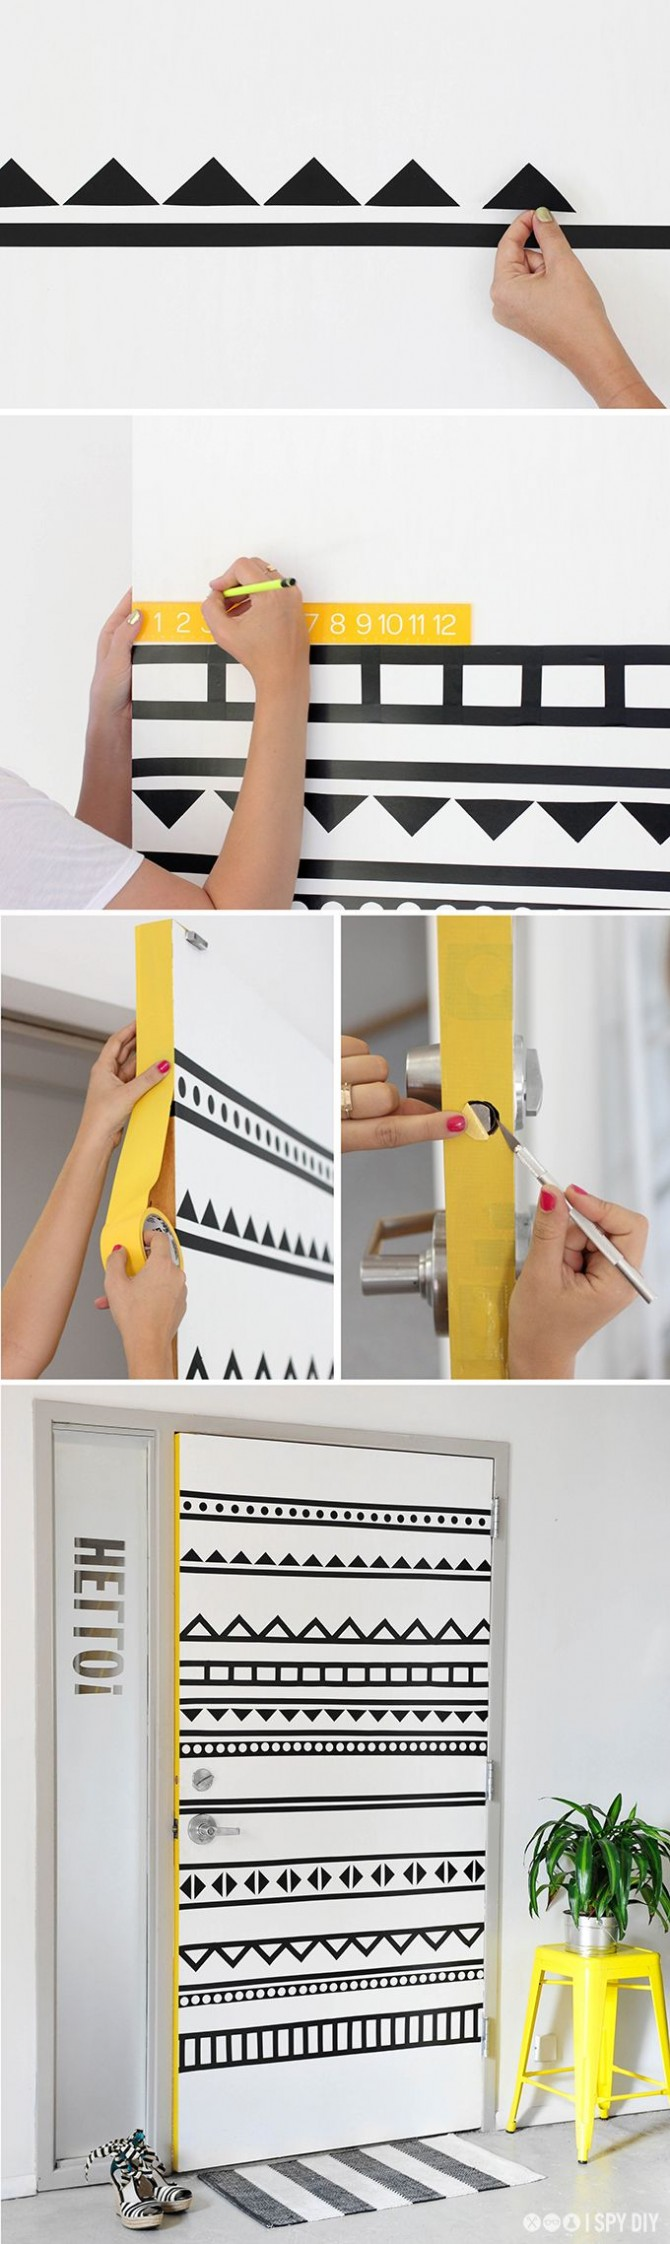 DIY decorated door